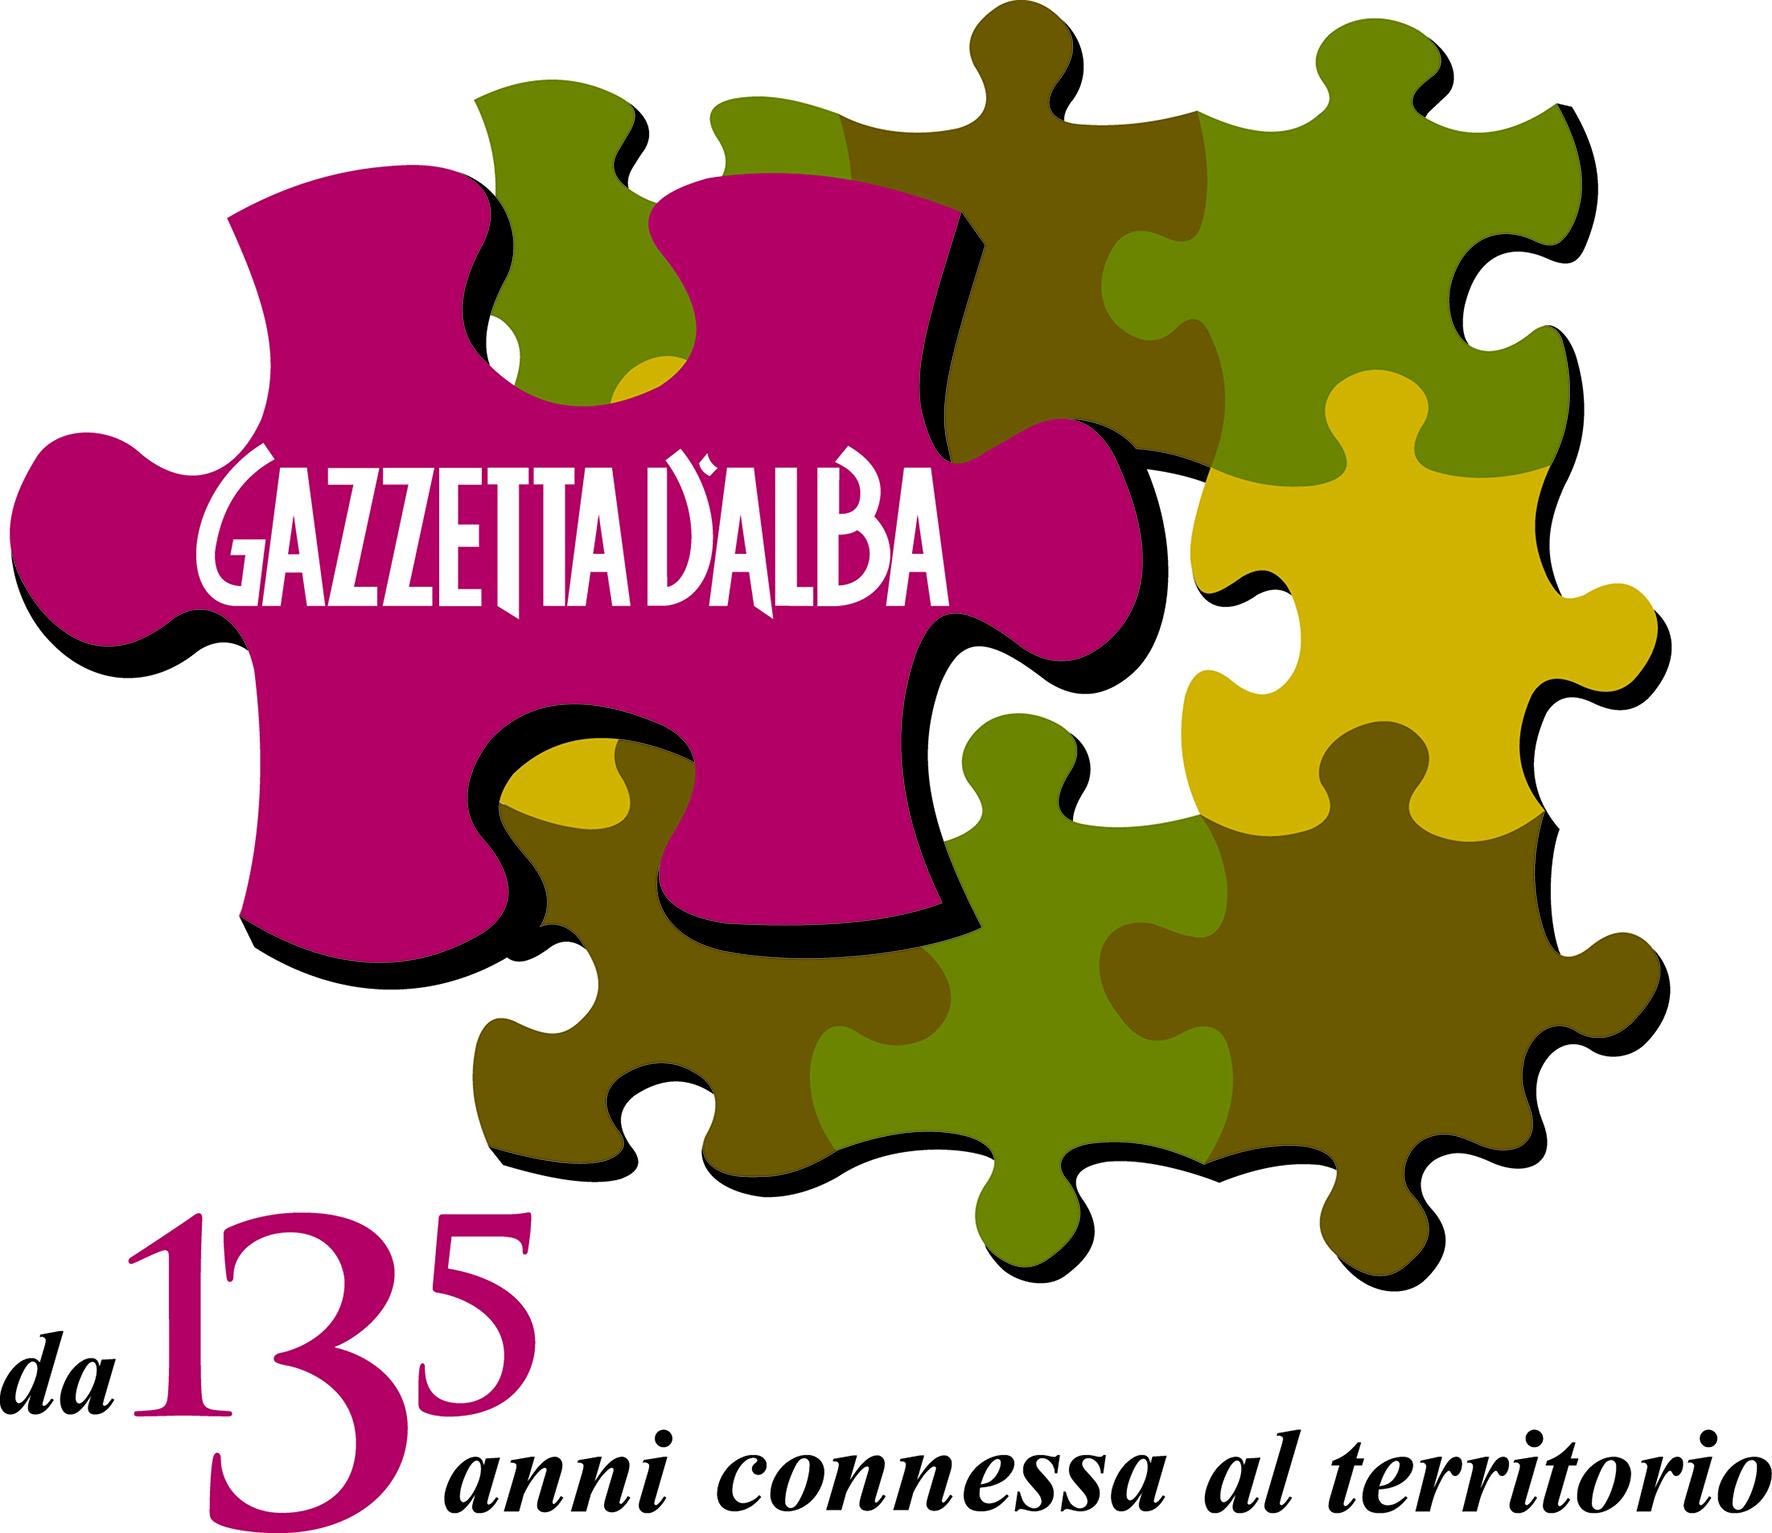 LOGO GAZZETTA D'ALBA 135 B